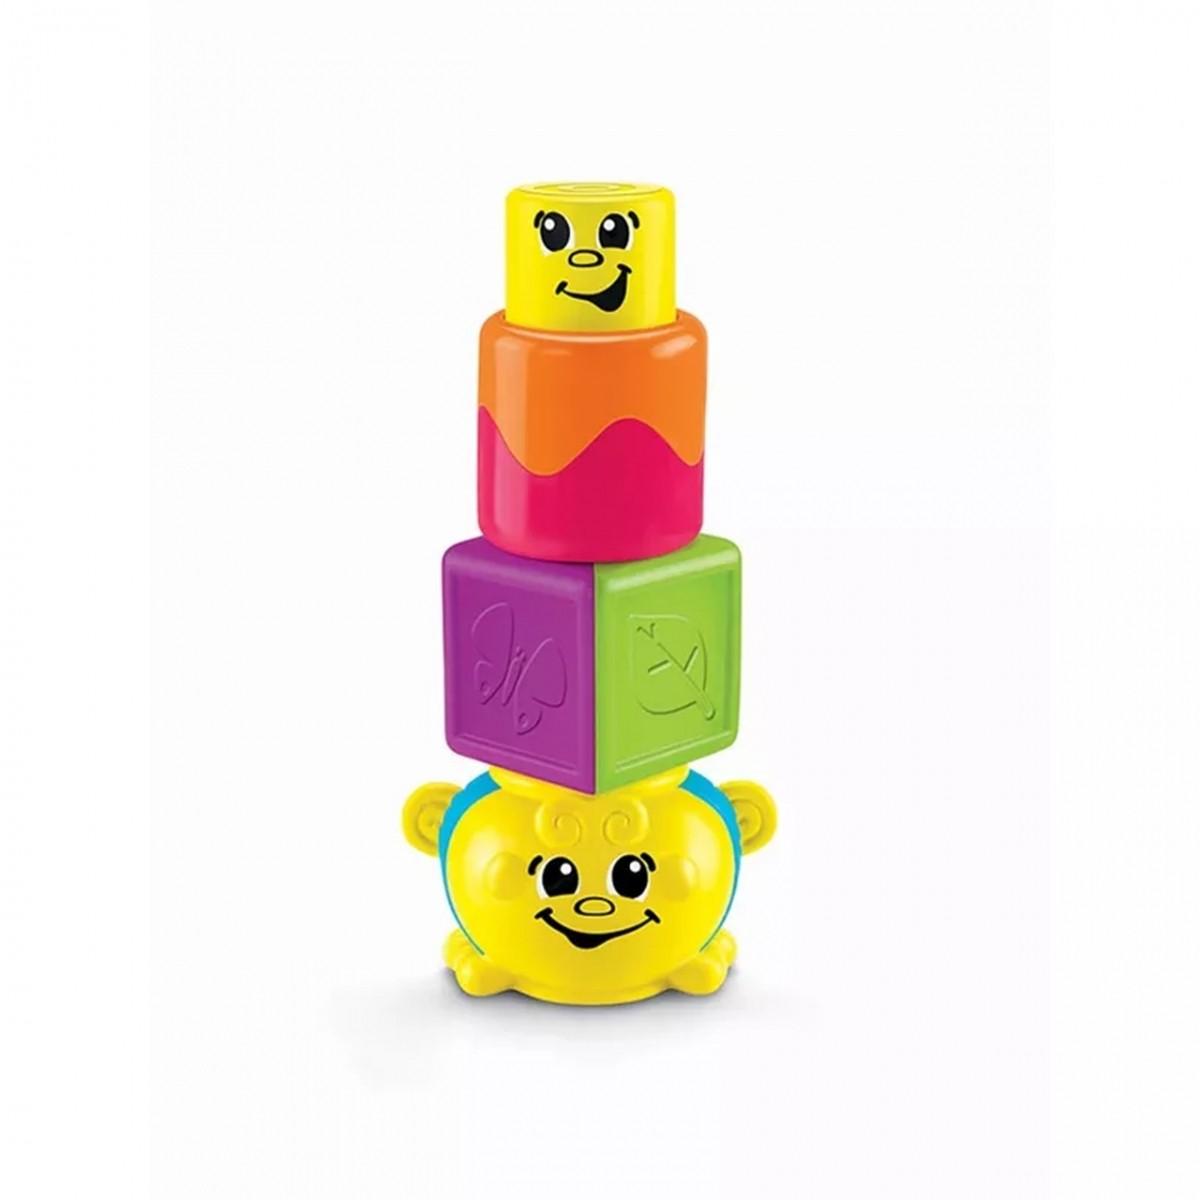 Blocos Divertidos: Abelha Divertida (Amarelo)